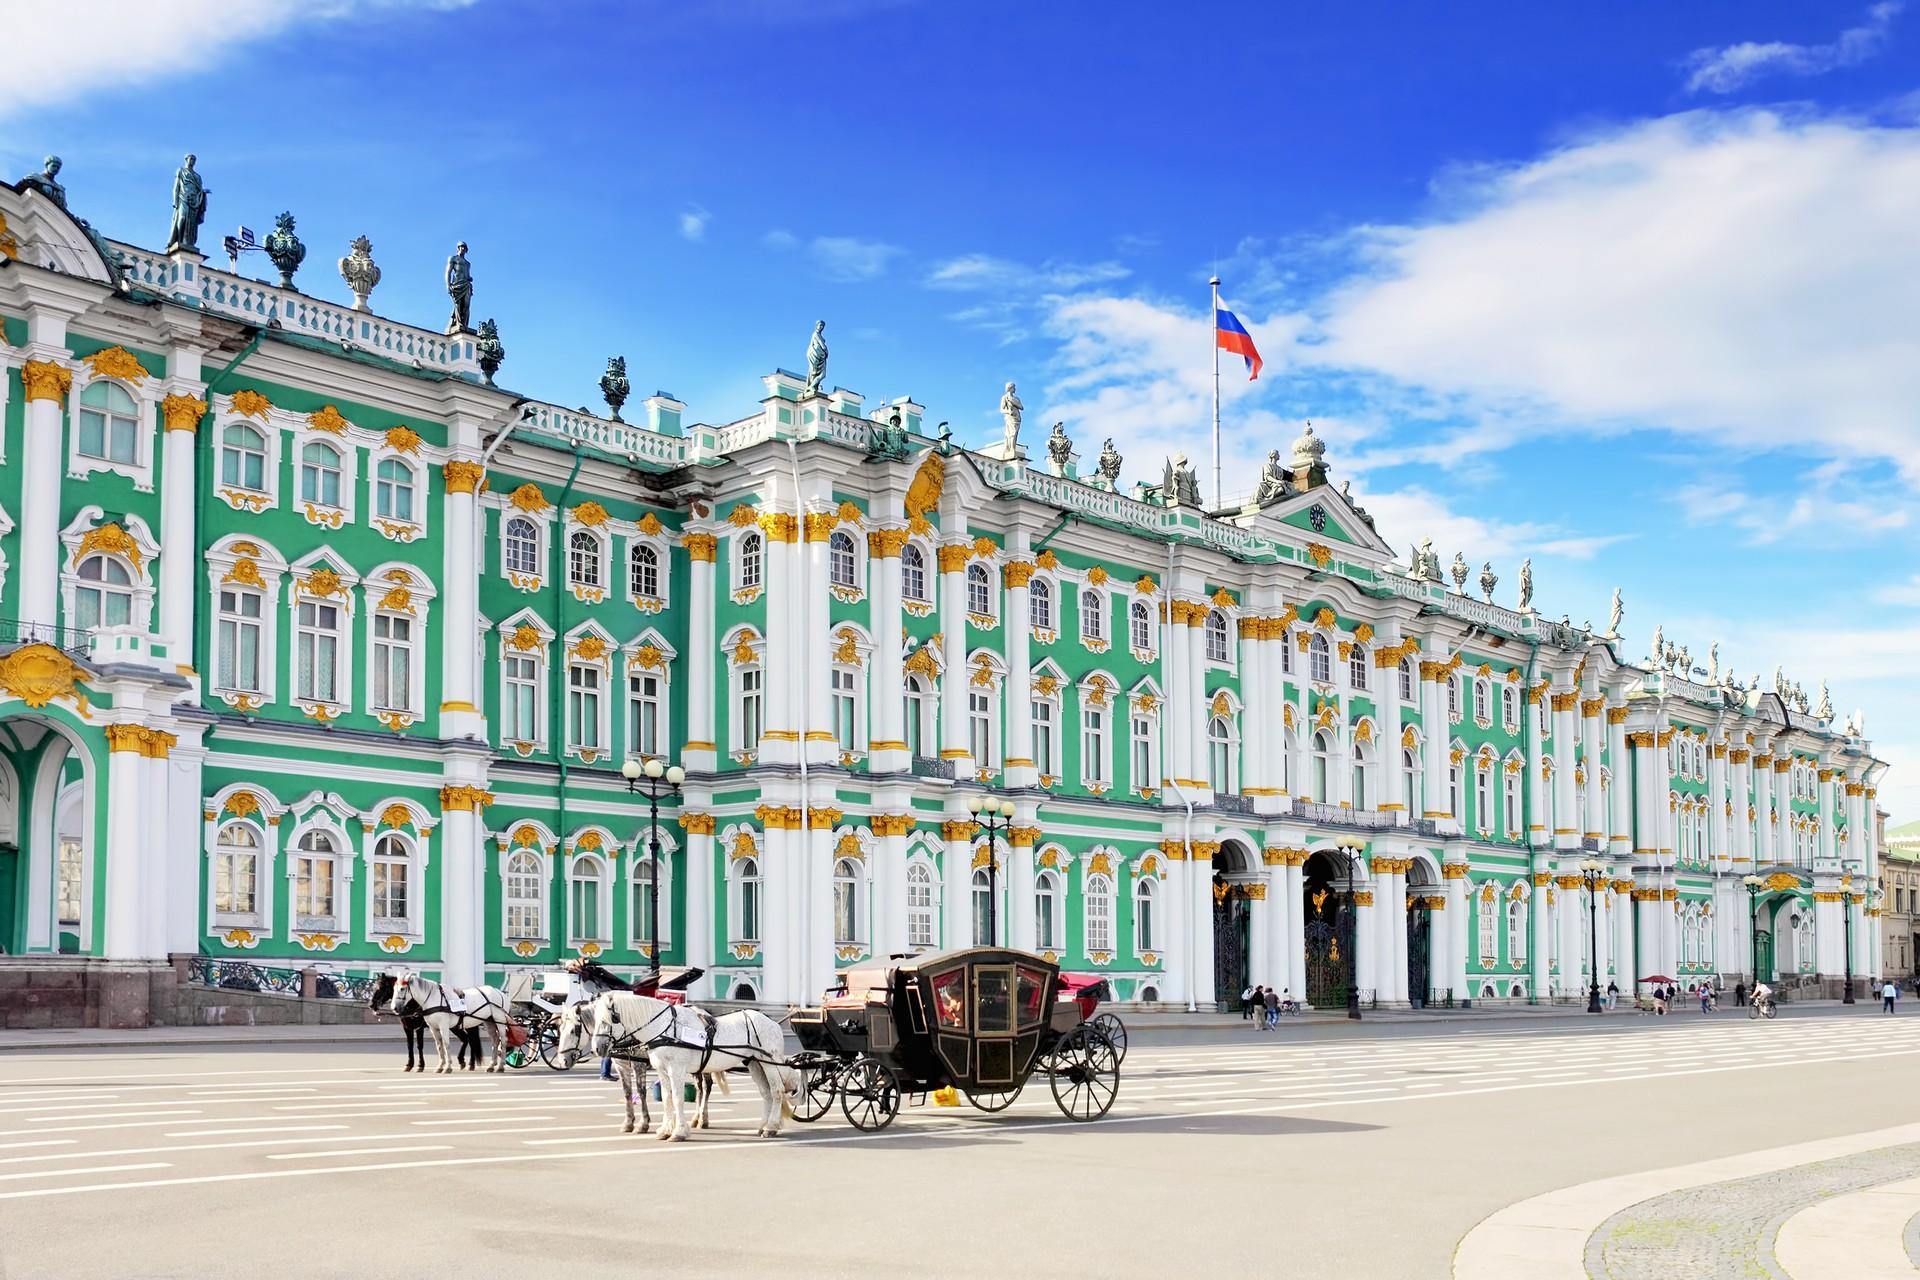 Leo Tolstoy's War and Peace begins in St Petersburg in 1805